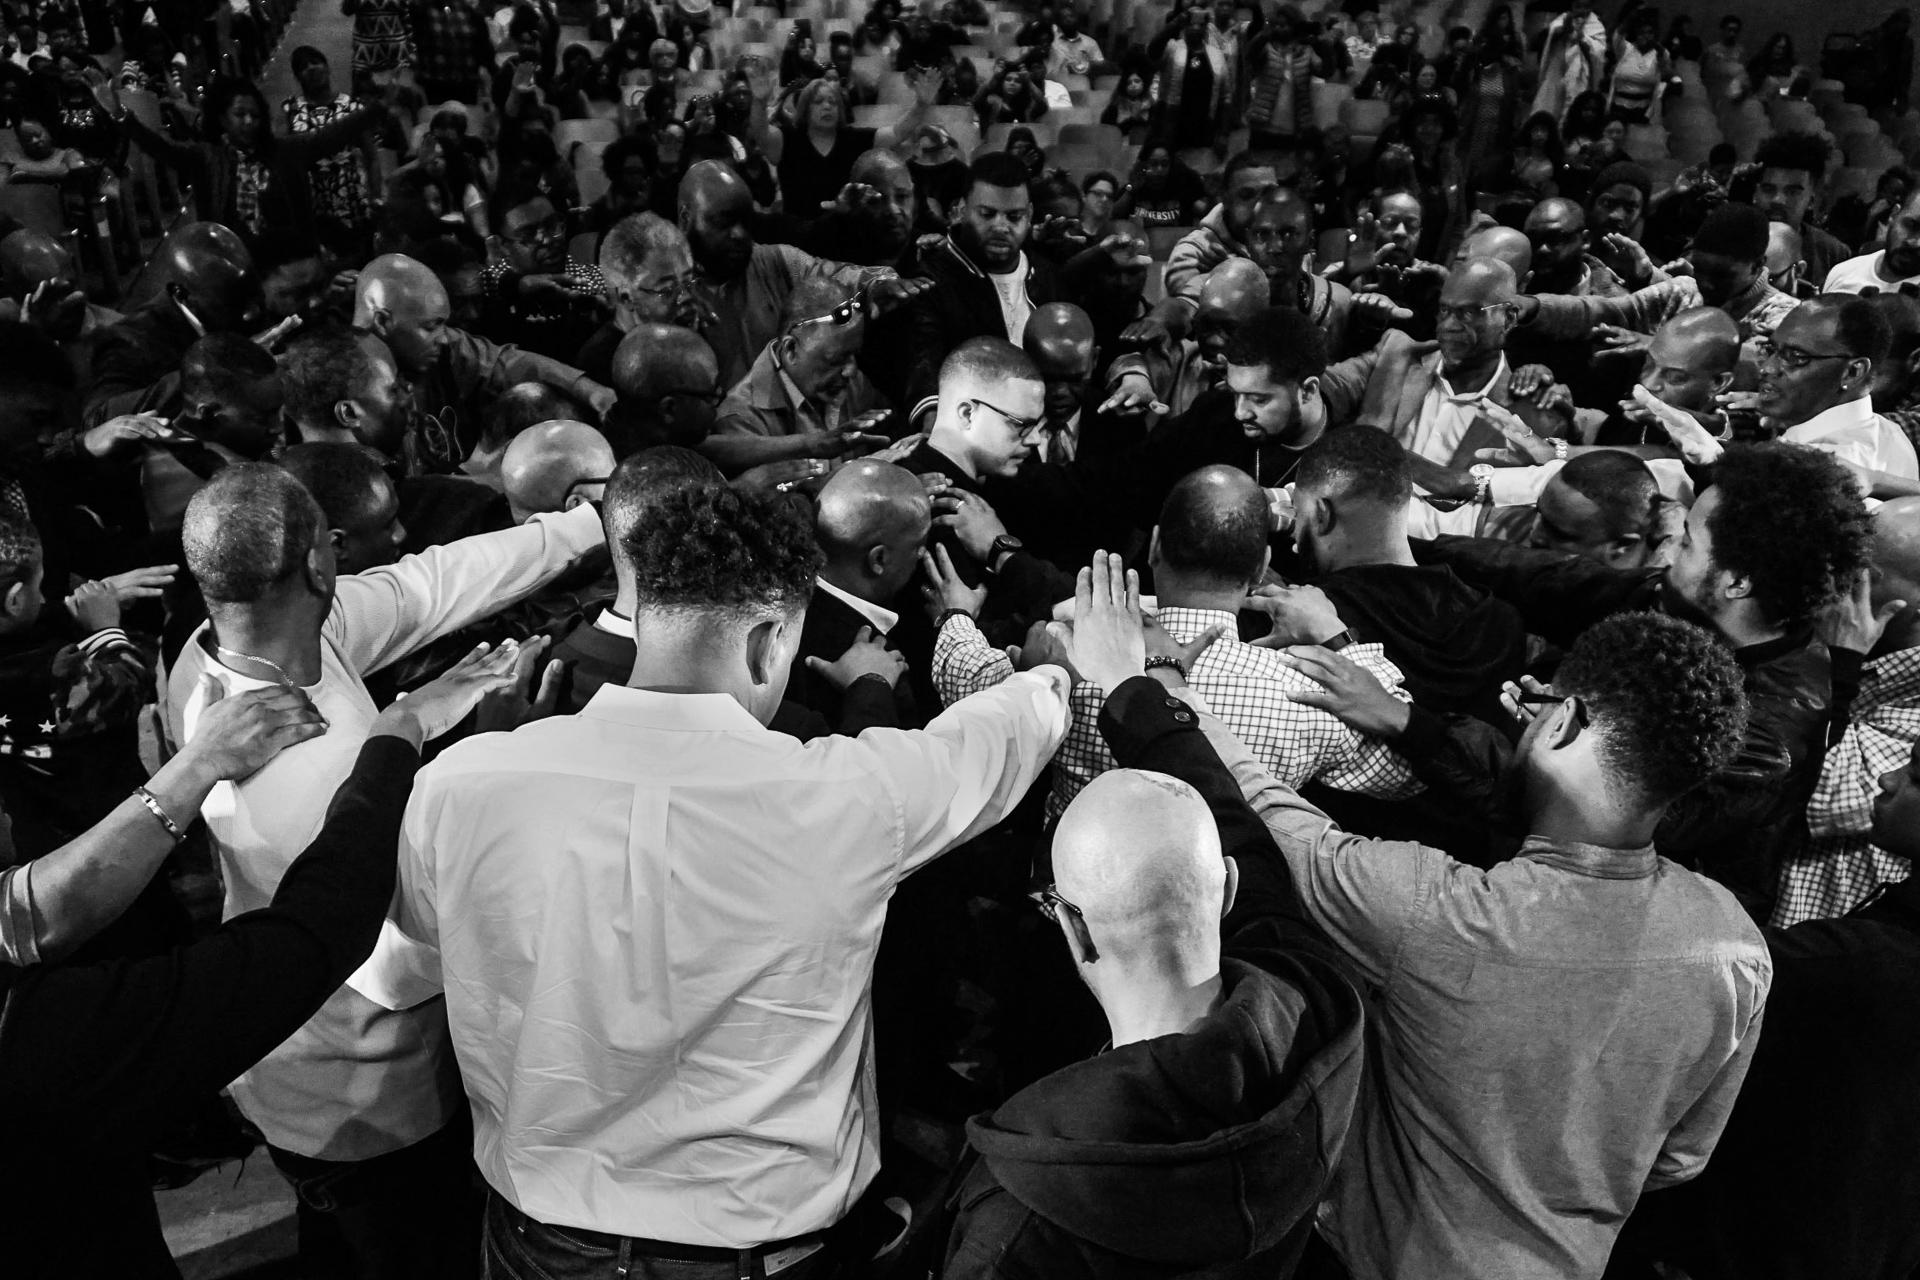 Shaun King receives prayer at church service.